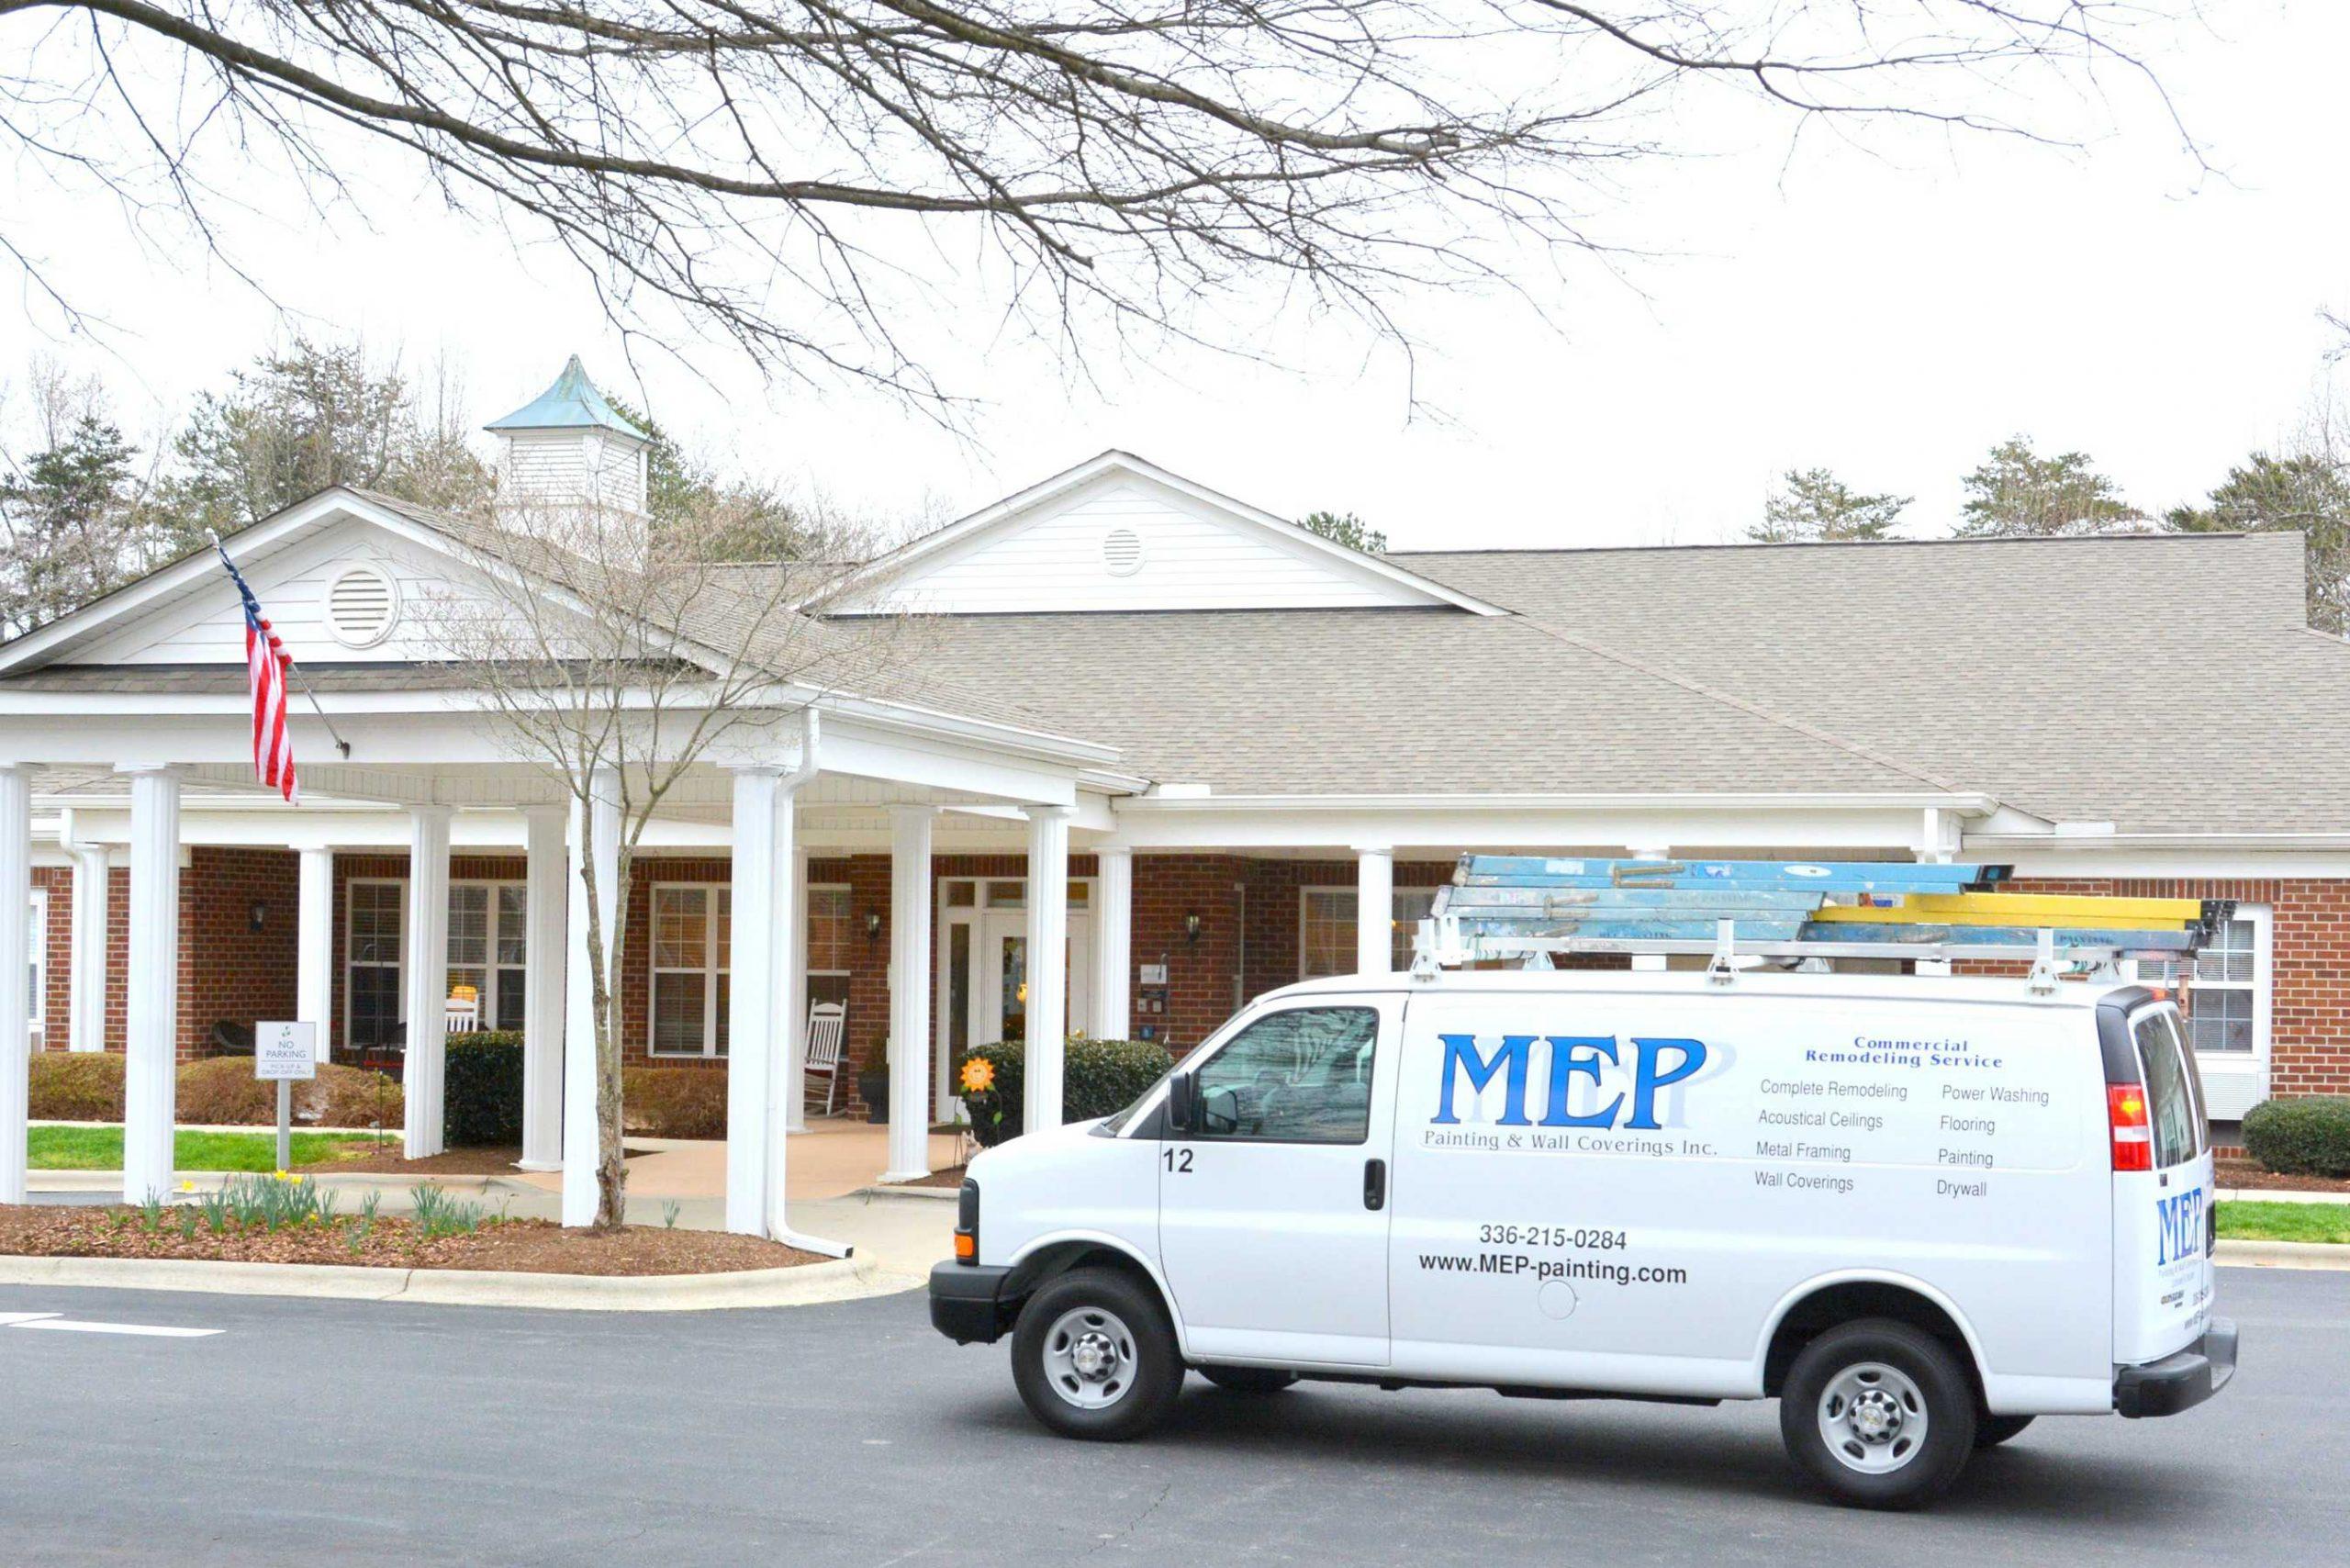 Retirement Home Remodel Contractors visit senior living facilities in MEP company van